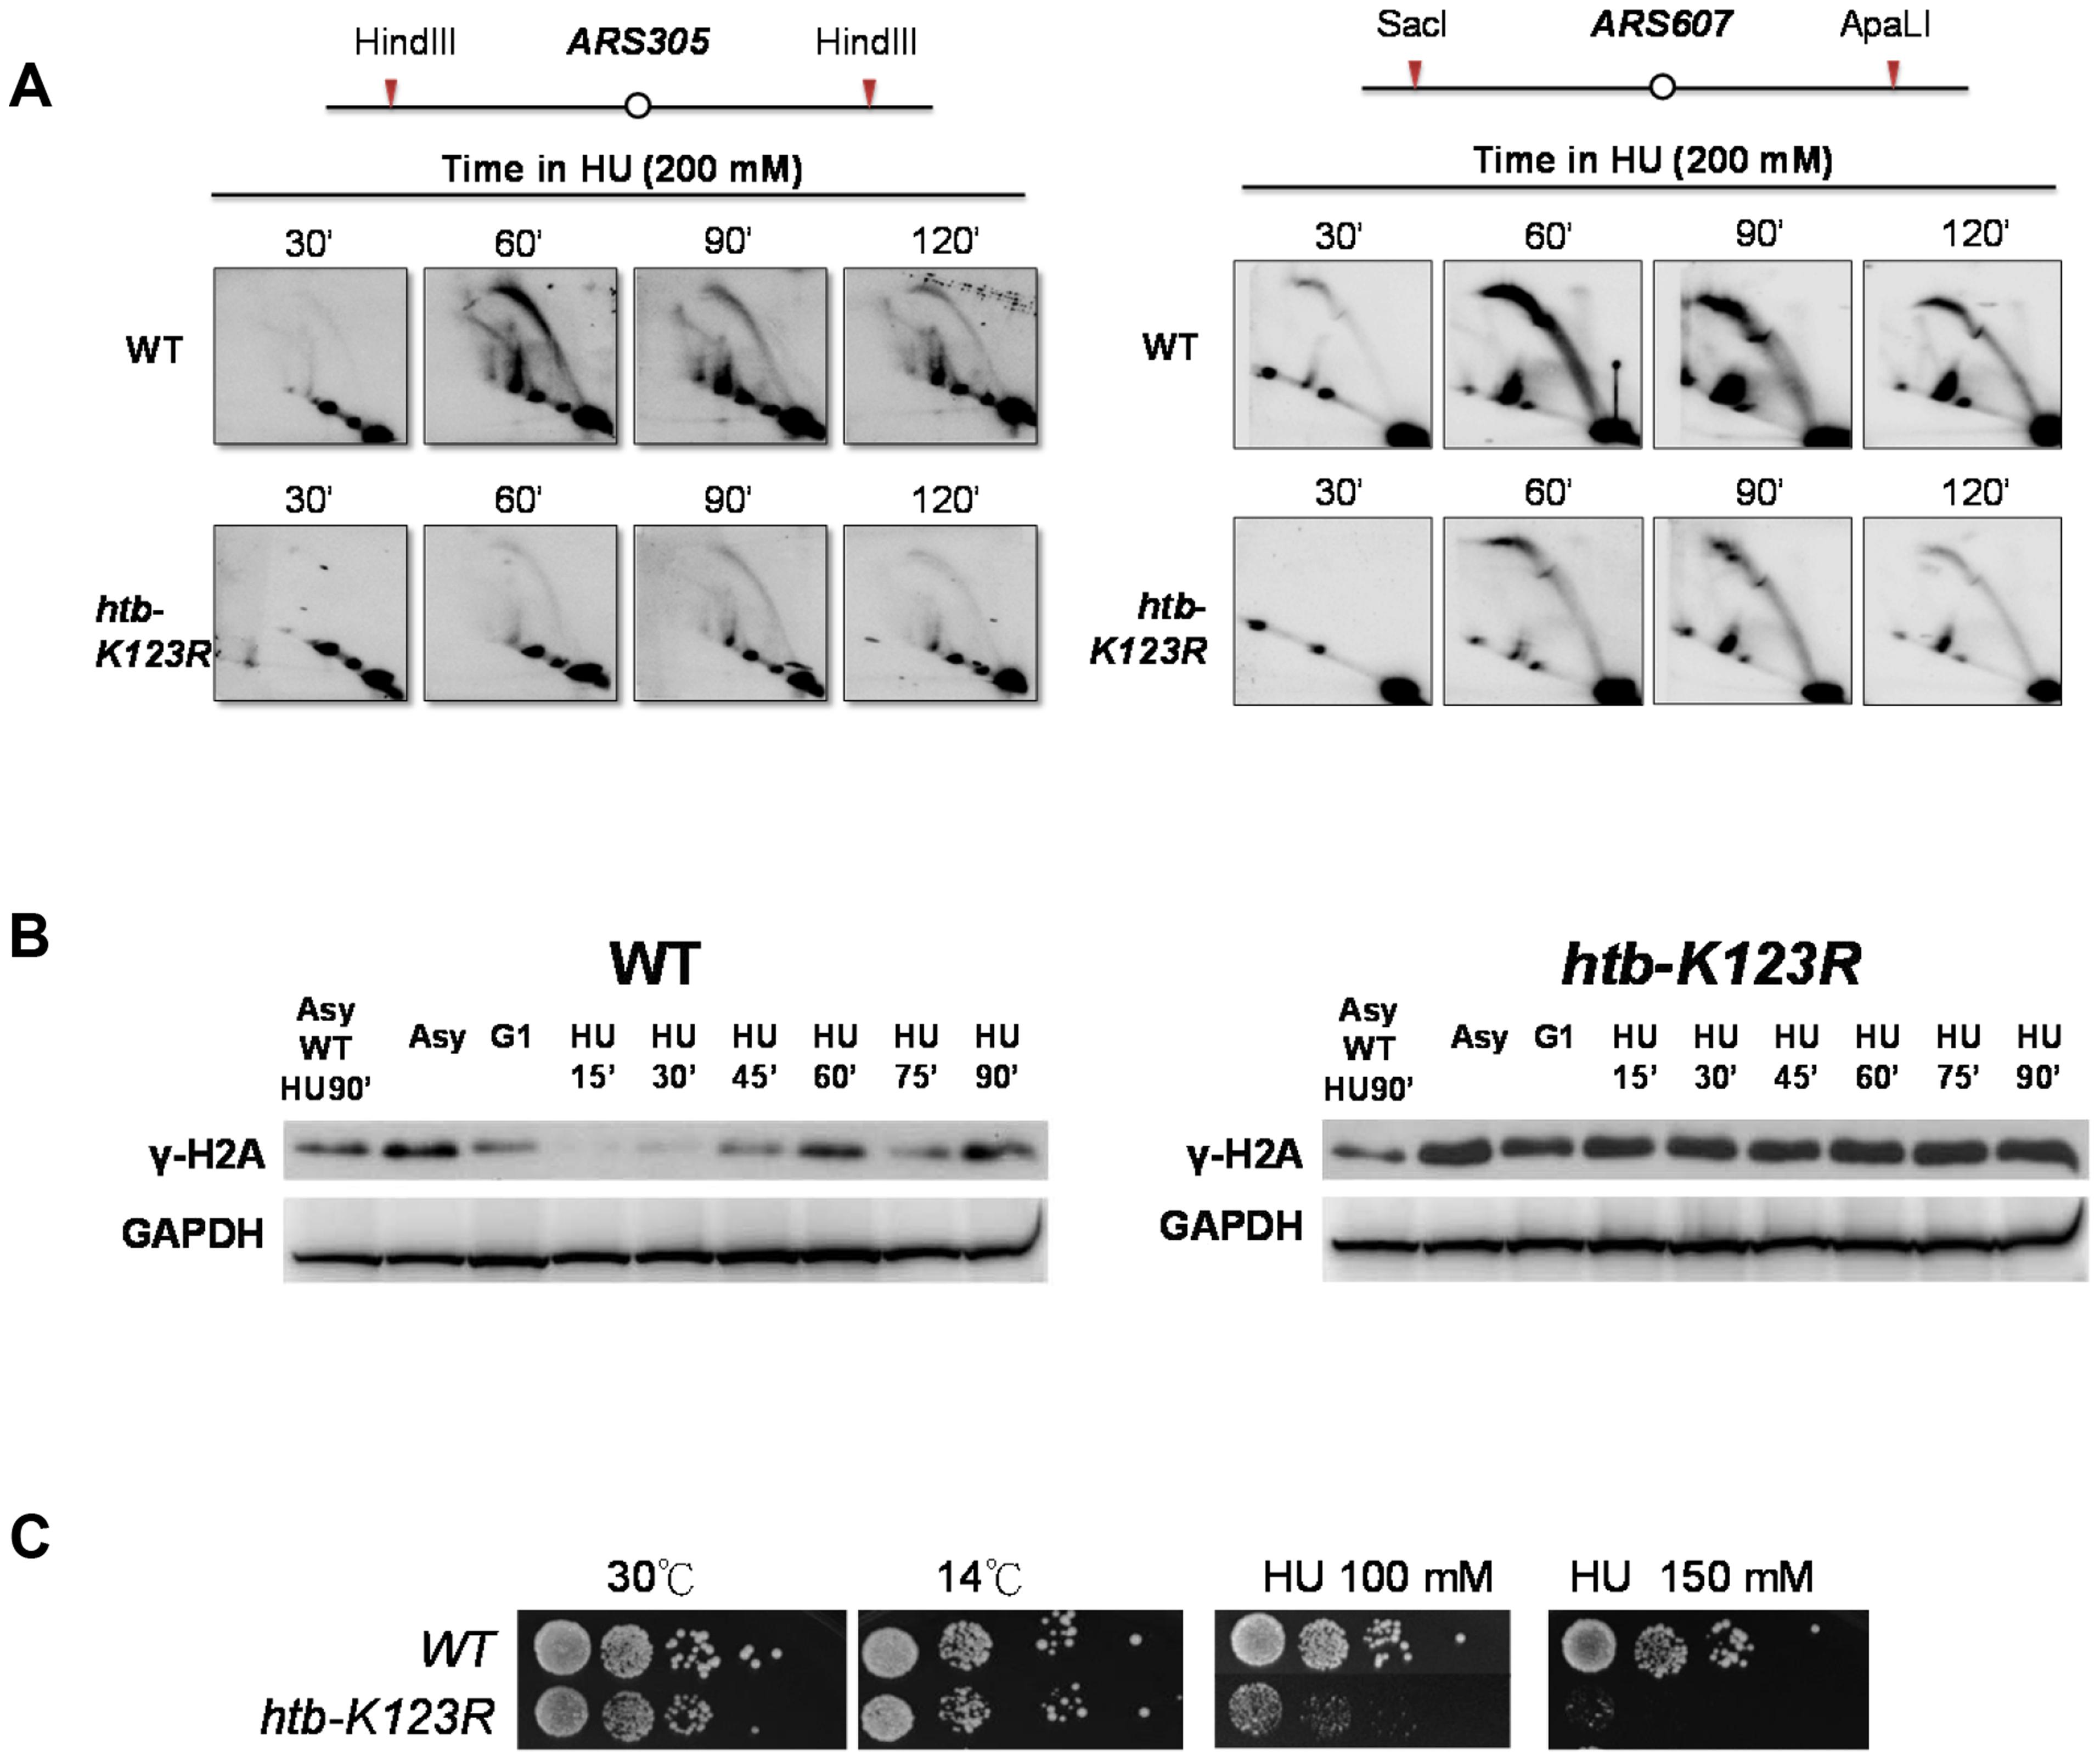 H2Bub preserves replication fork stability under HU stress.